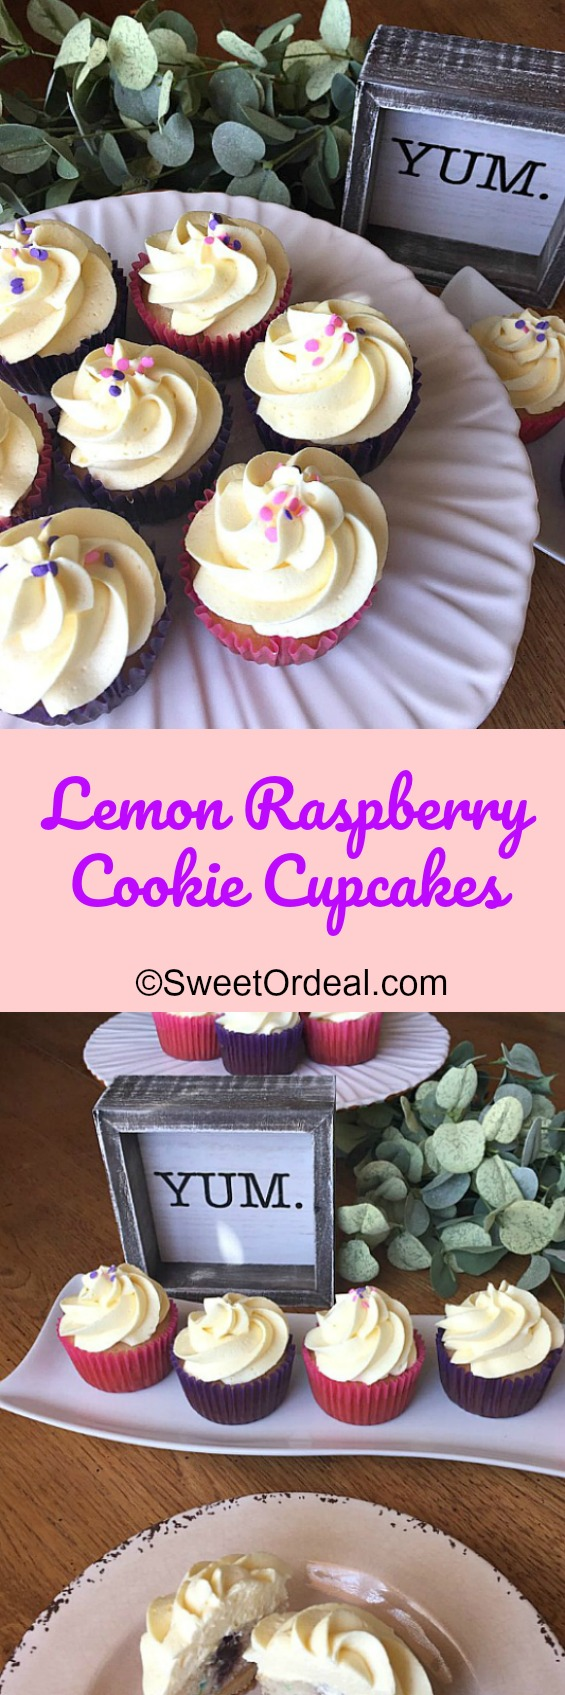 Lemon Raspberry Cookie Cupcakes